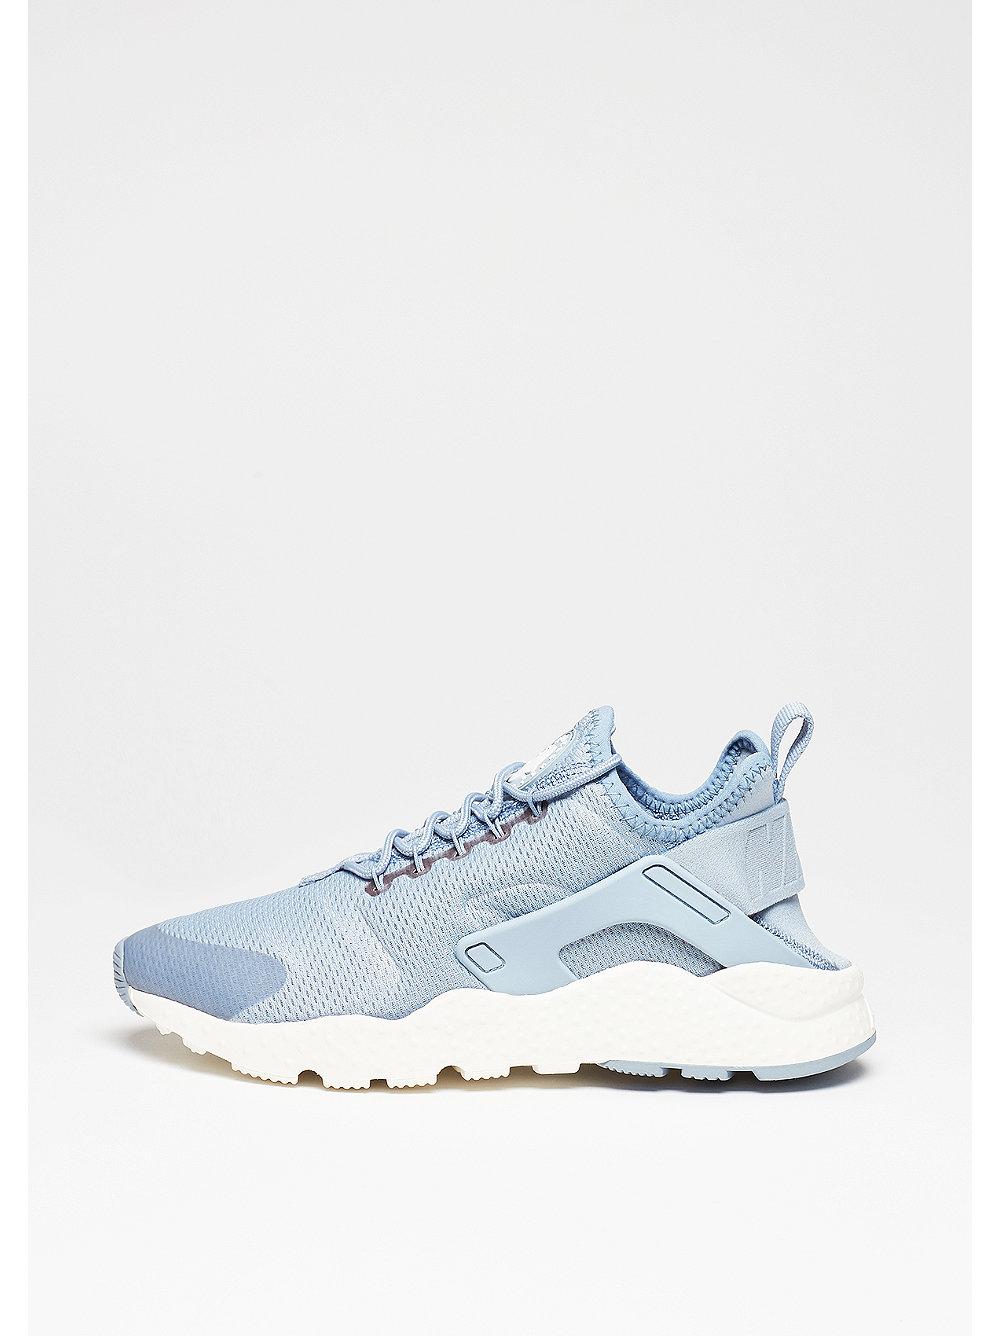 Nike Air Huarache Run damessneaker blauw, grijs en wit